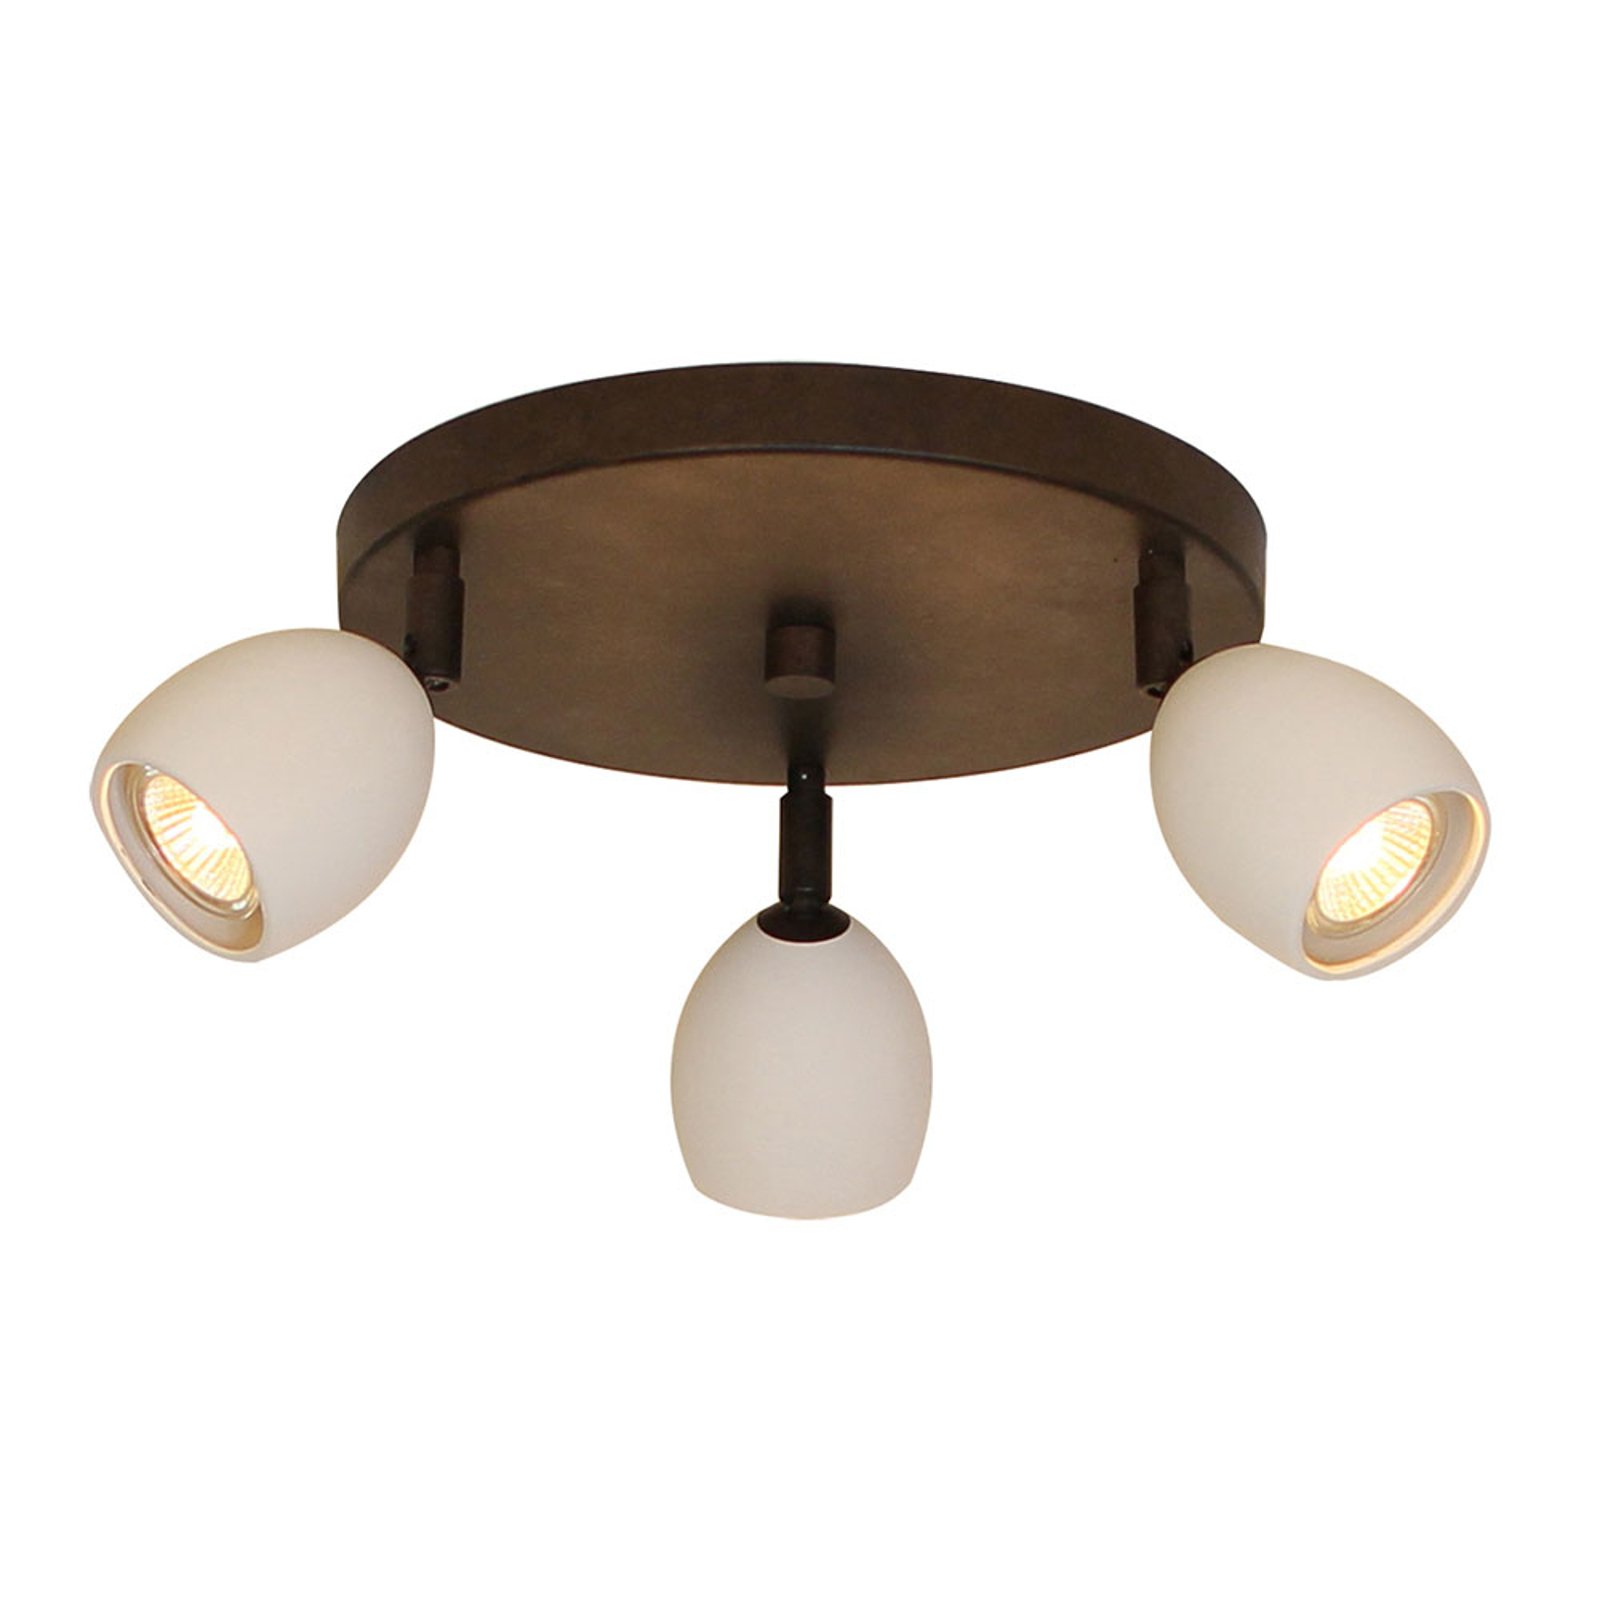 Menzel Provence lampa sufitowa 3-pkt. okrągła